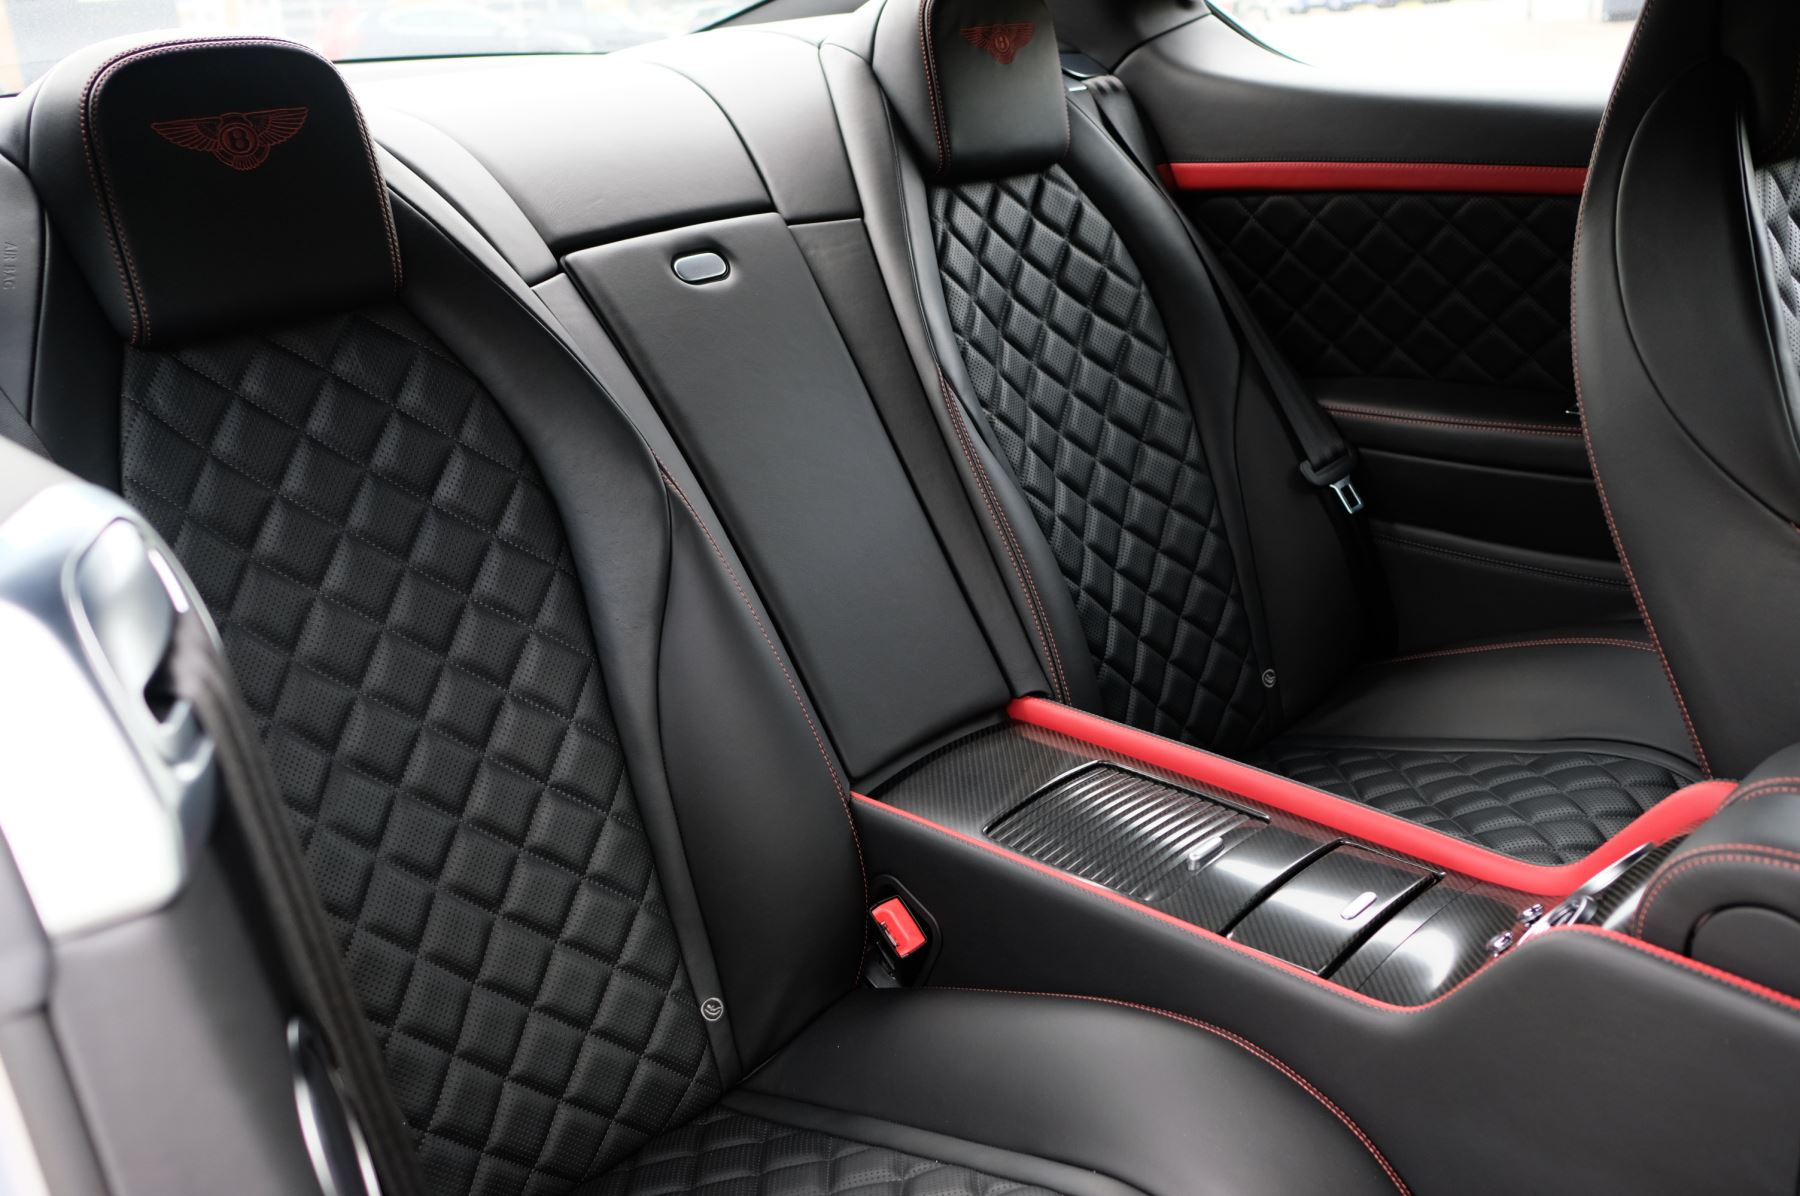 Bentley Continental GT 6.0 W12 [635] Speed - Premier Specification - Carbon Fibre Fascia Panels image 14